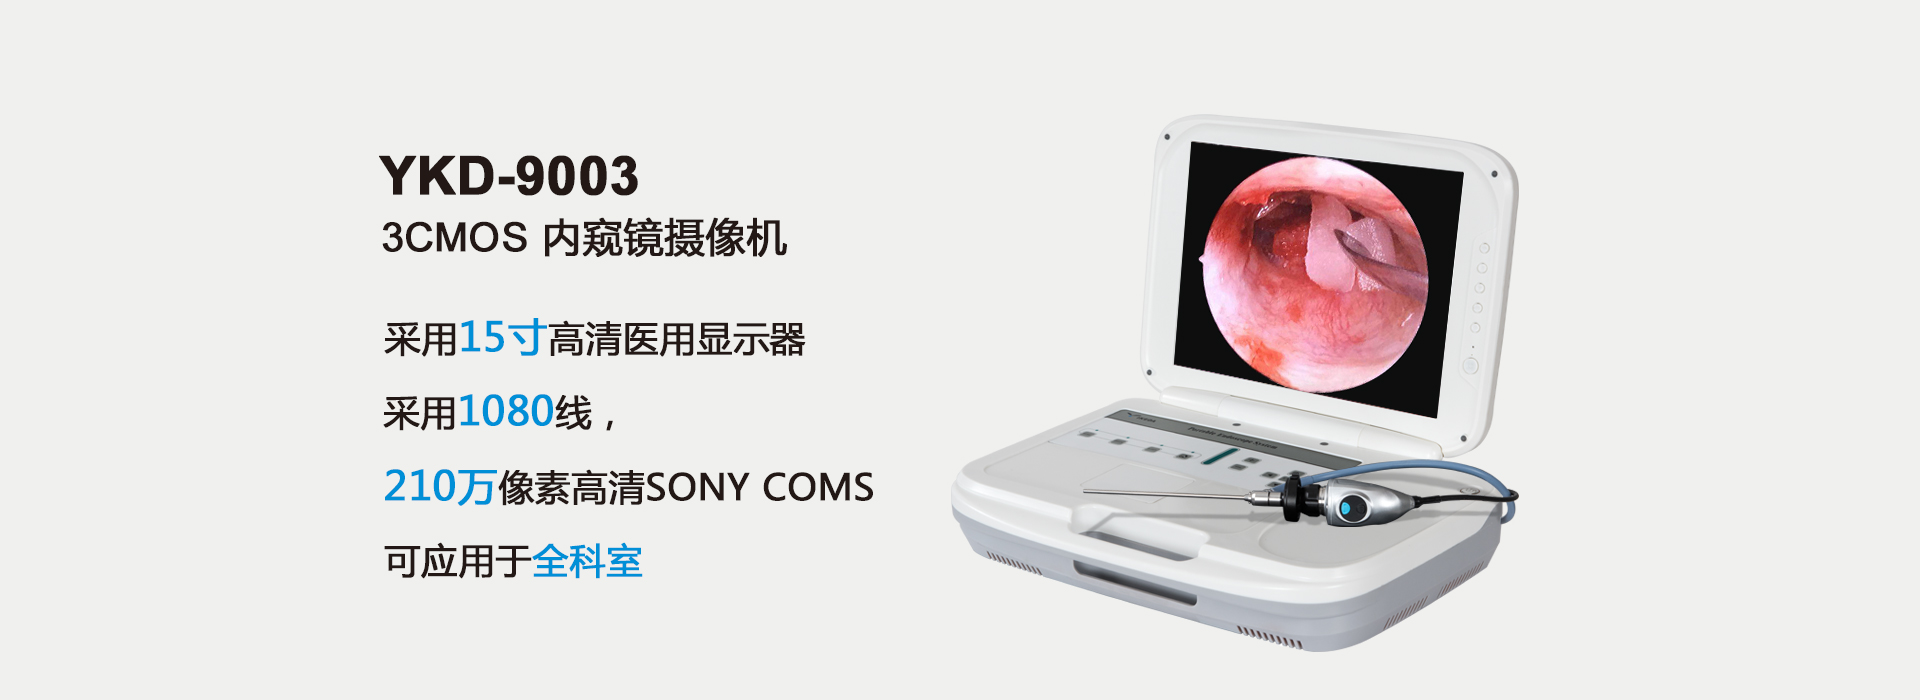 YKD-9003 3CMOS 内窥镜摄像机